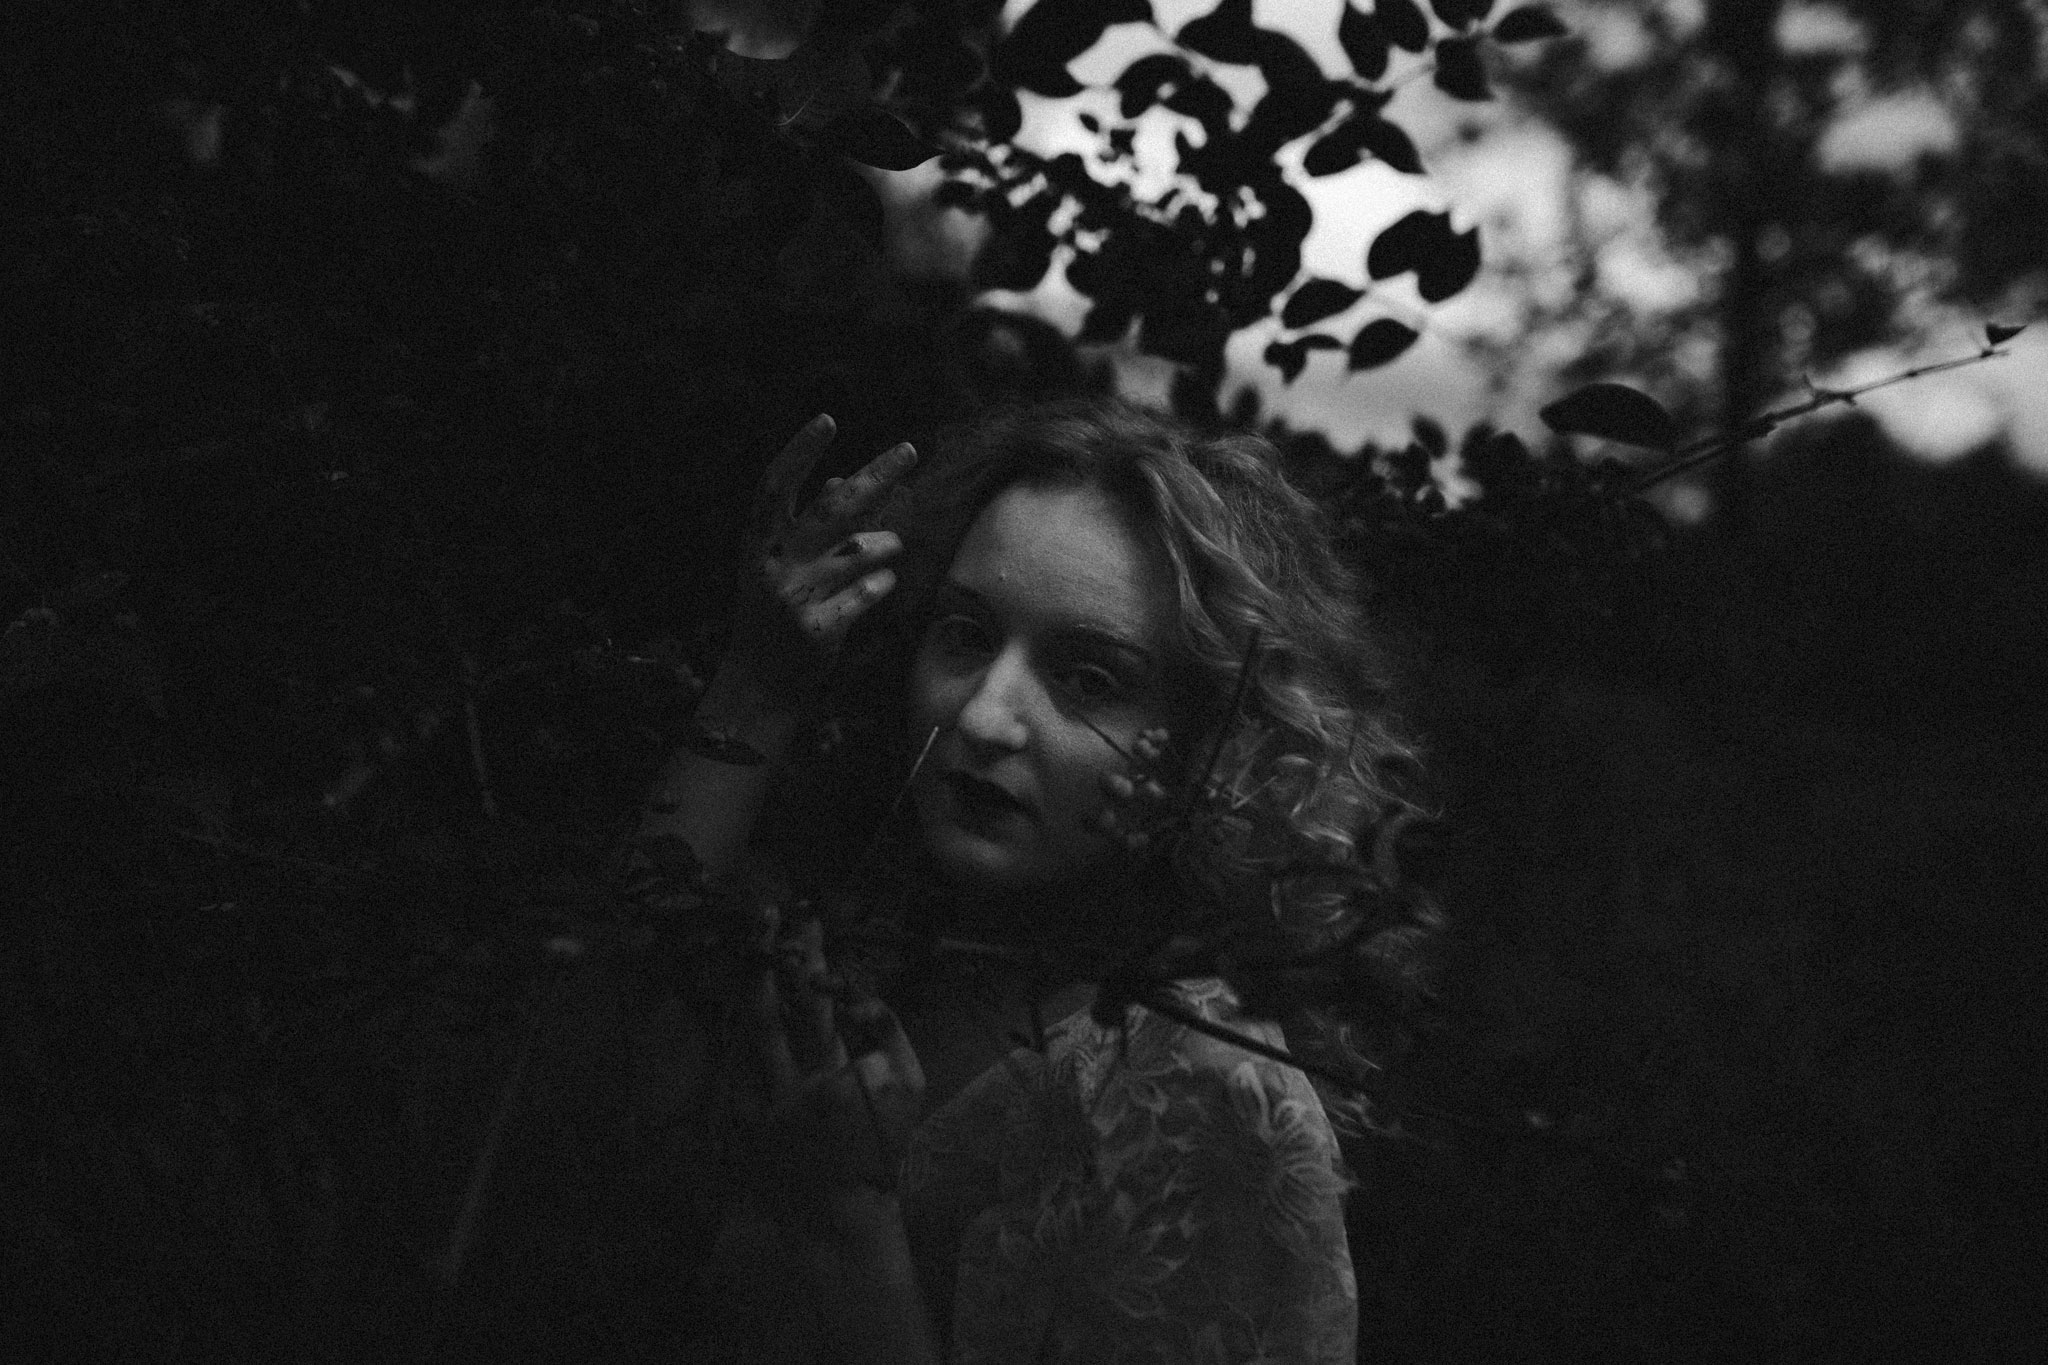 pale-witch-168fb.jpg